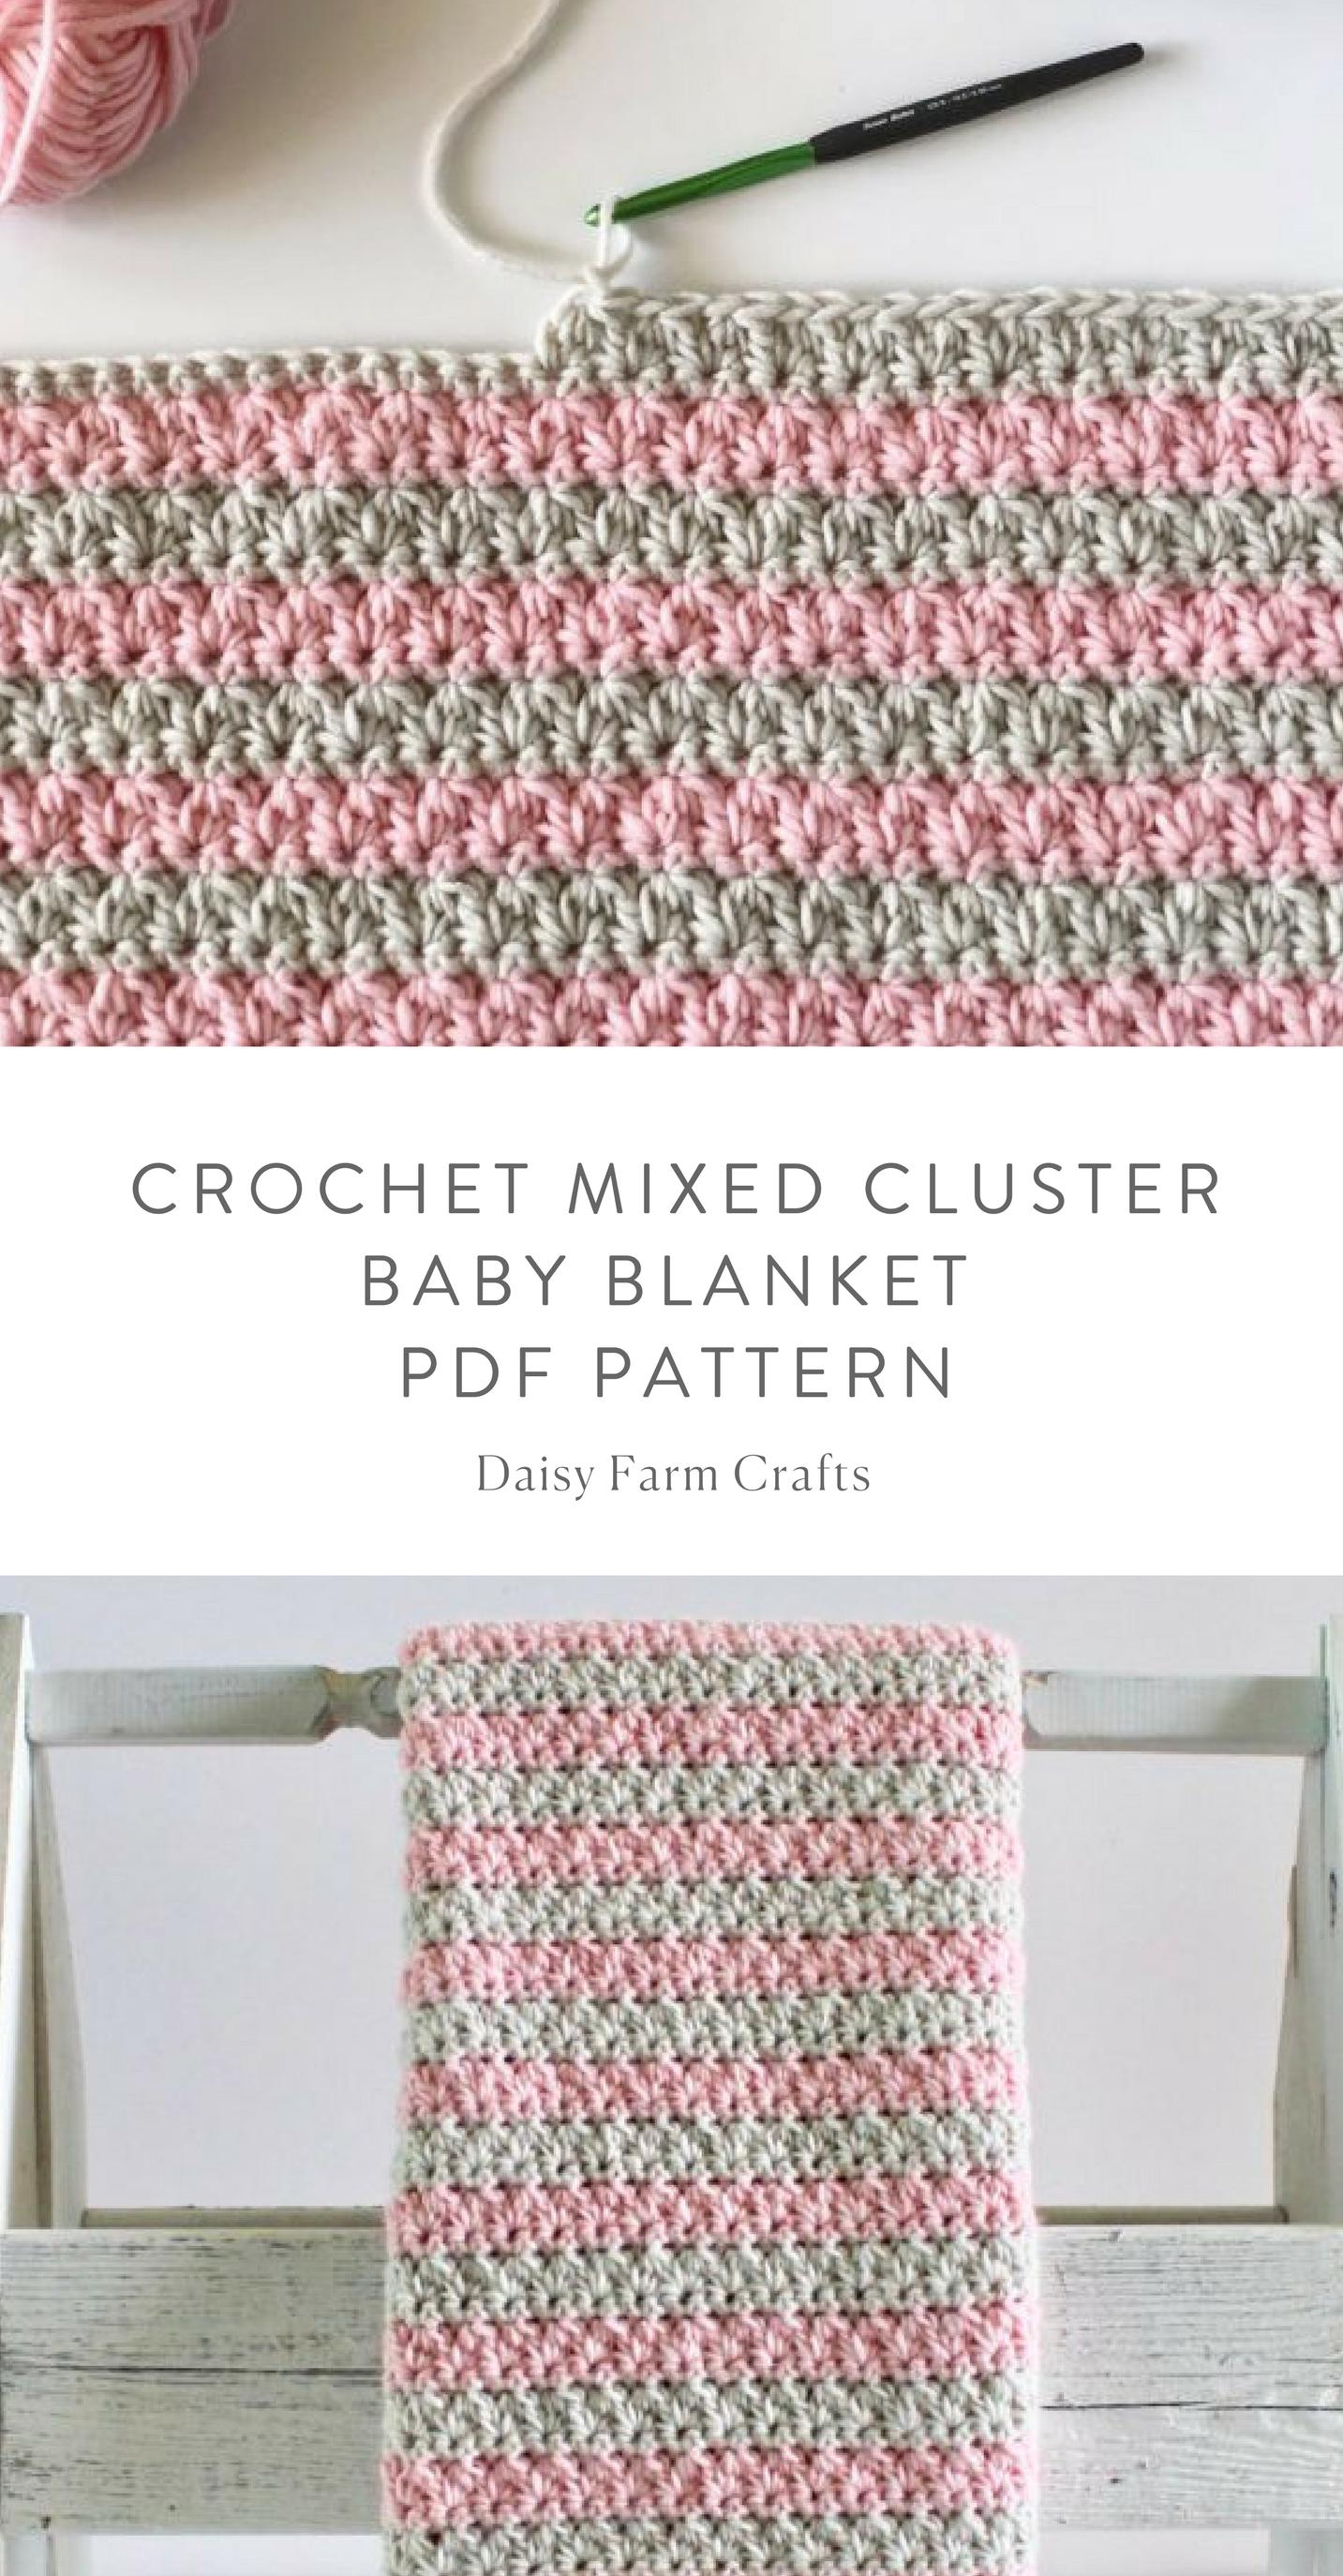 Crochet Mixed Cluster Baby Blanket Etsy Pdf Pattern Crochet Etsy